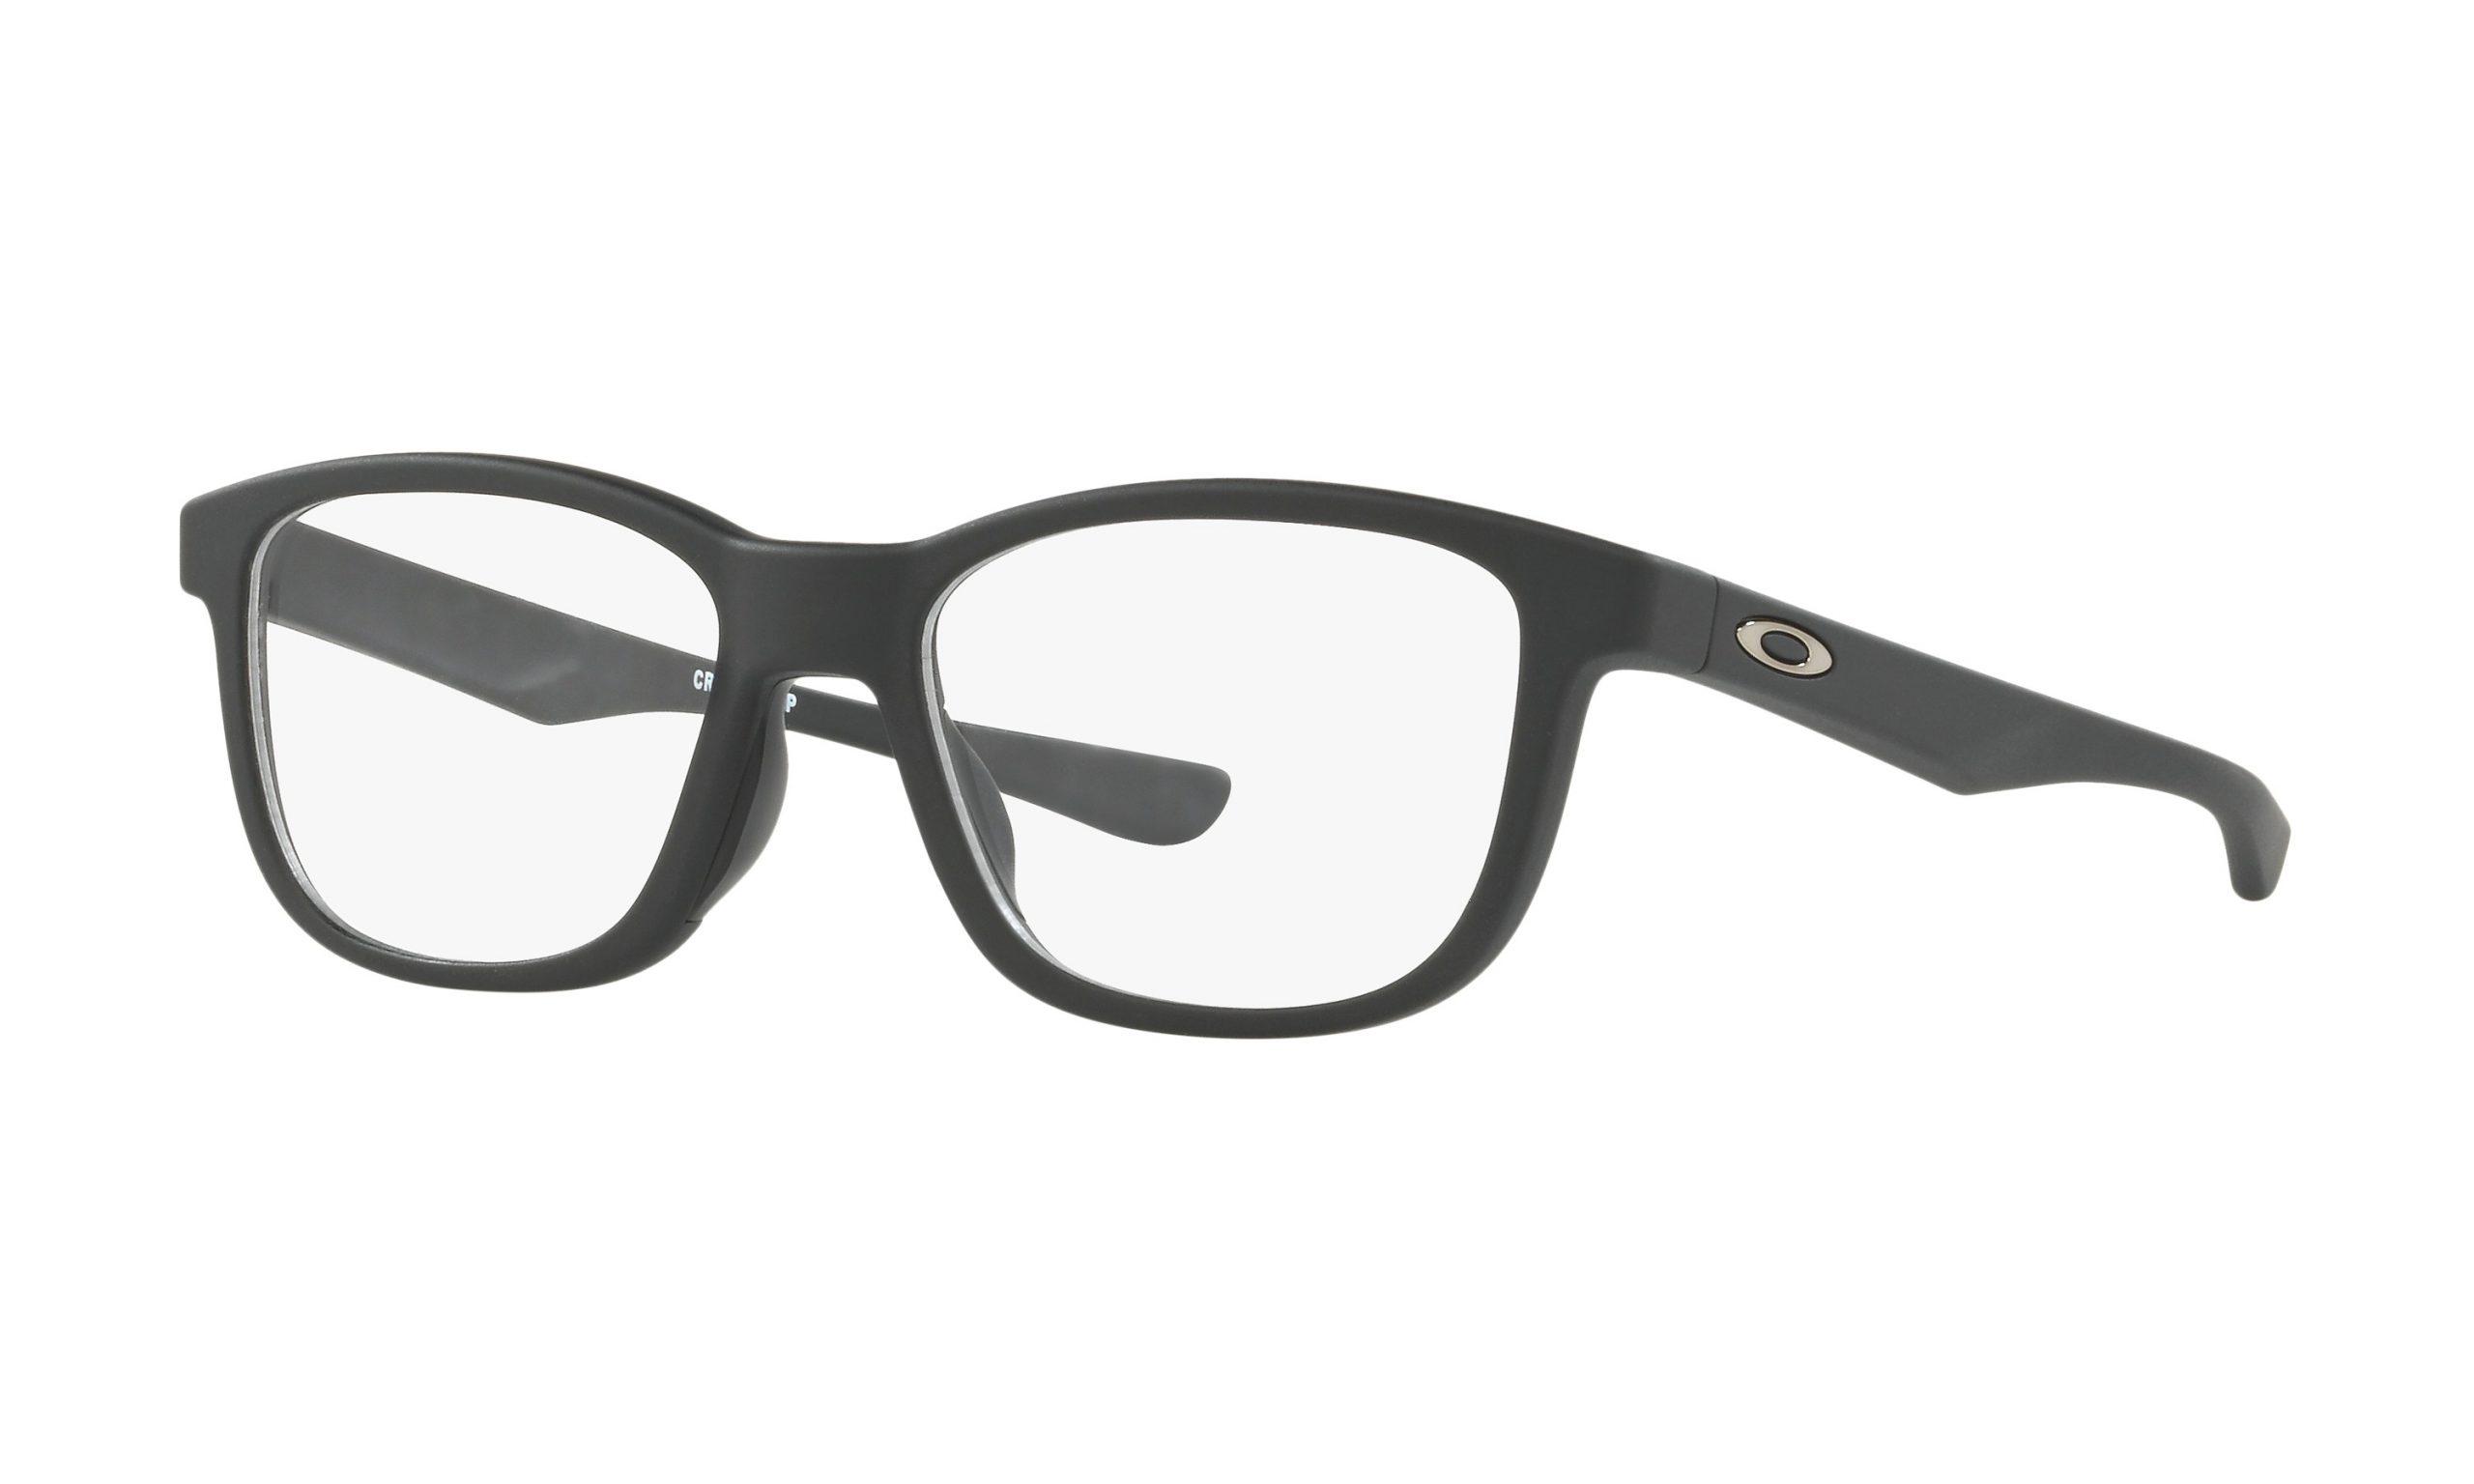 Gọng kính Oakley OX8106-01